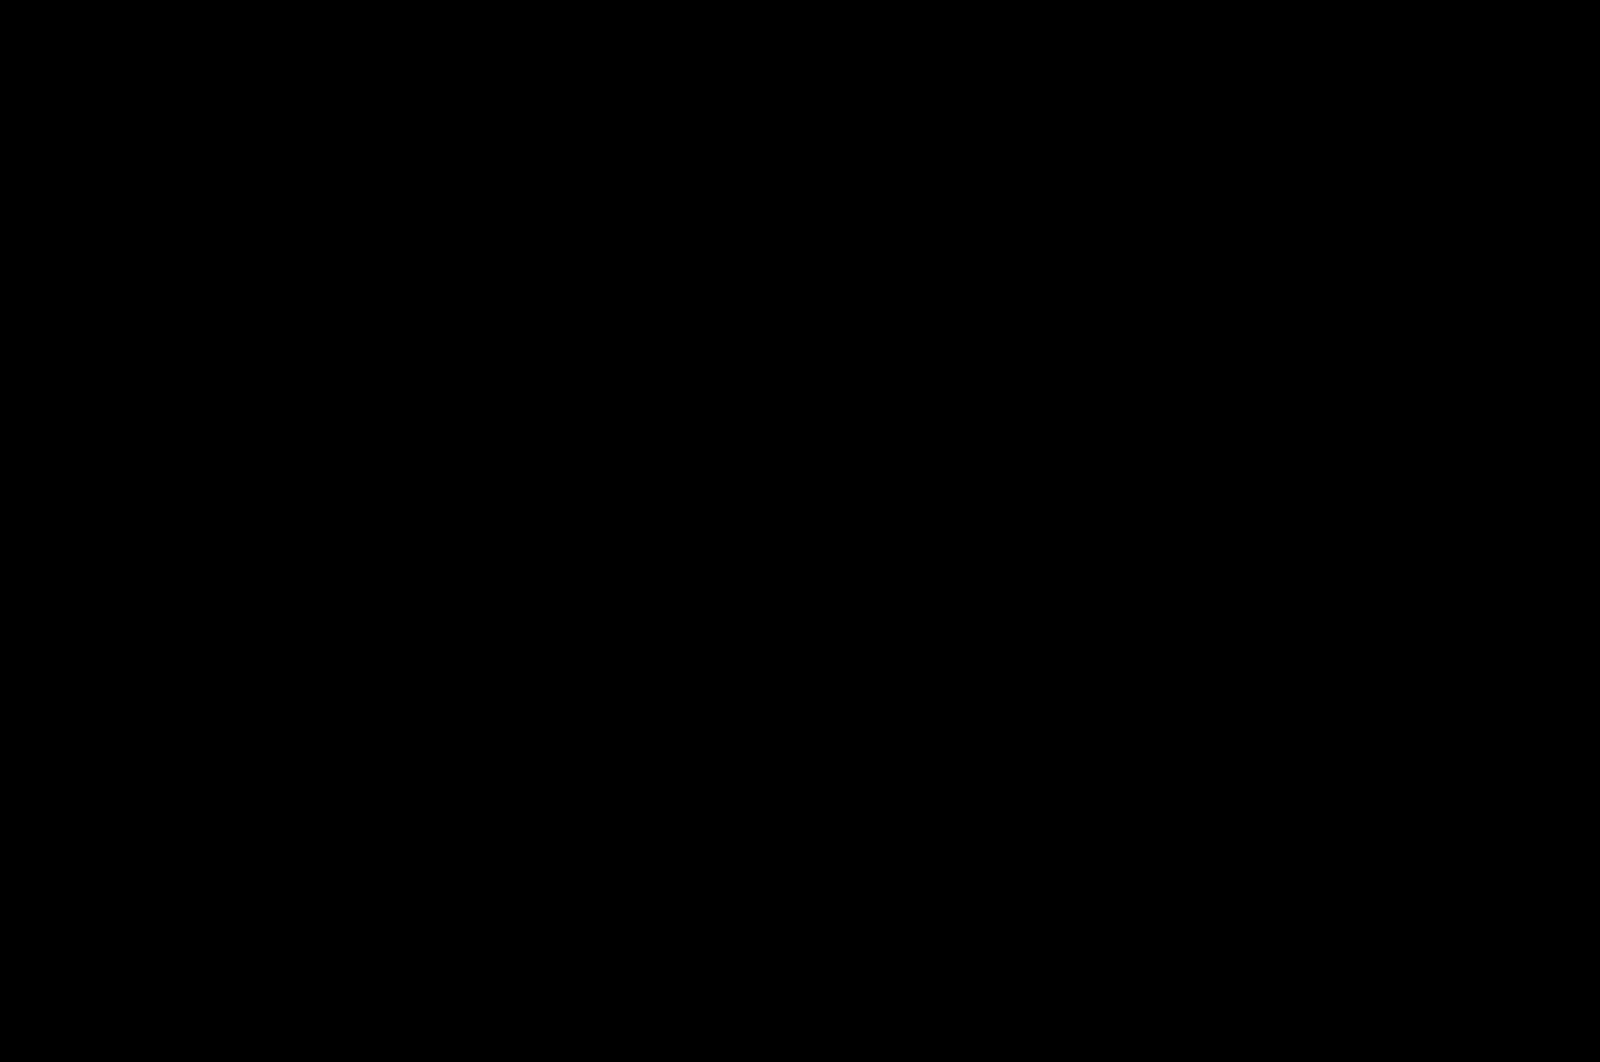 black background black background black background black background 1600x1062